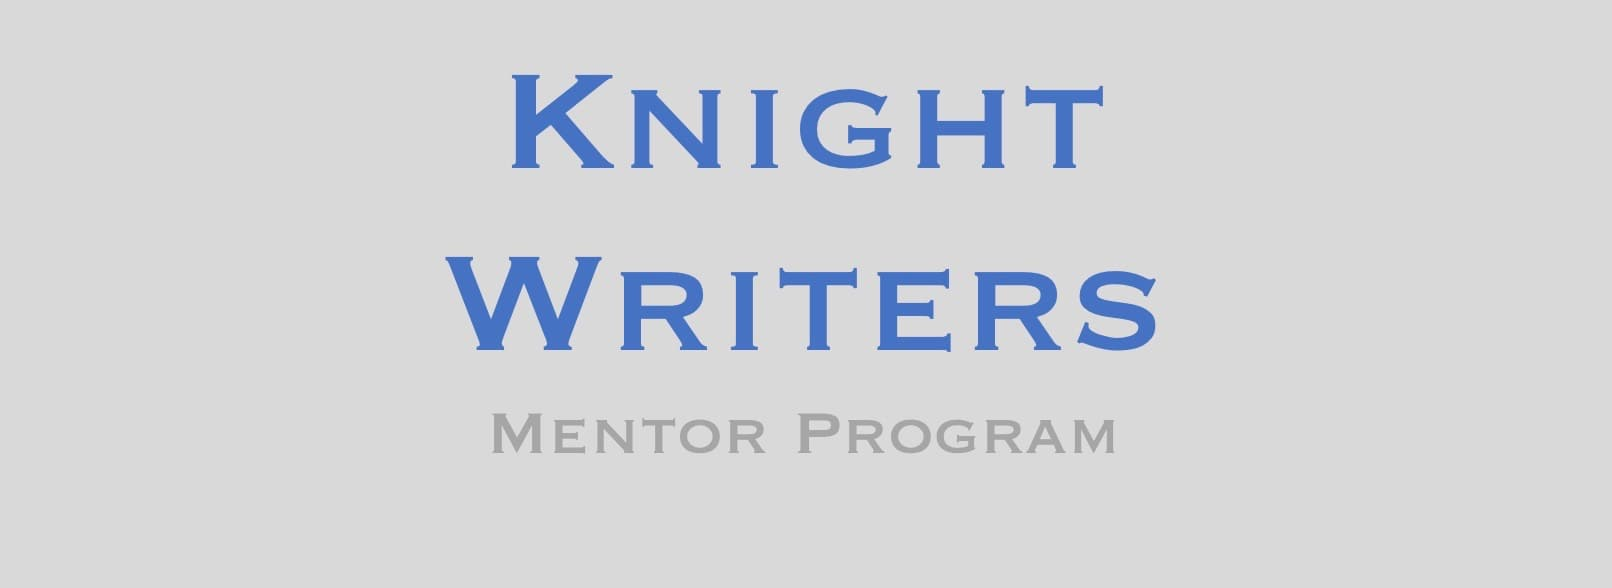 KNIGHT WRITERS | Just Write